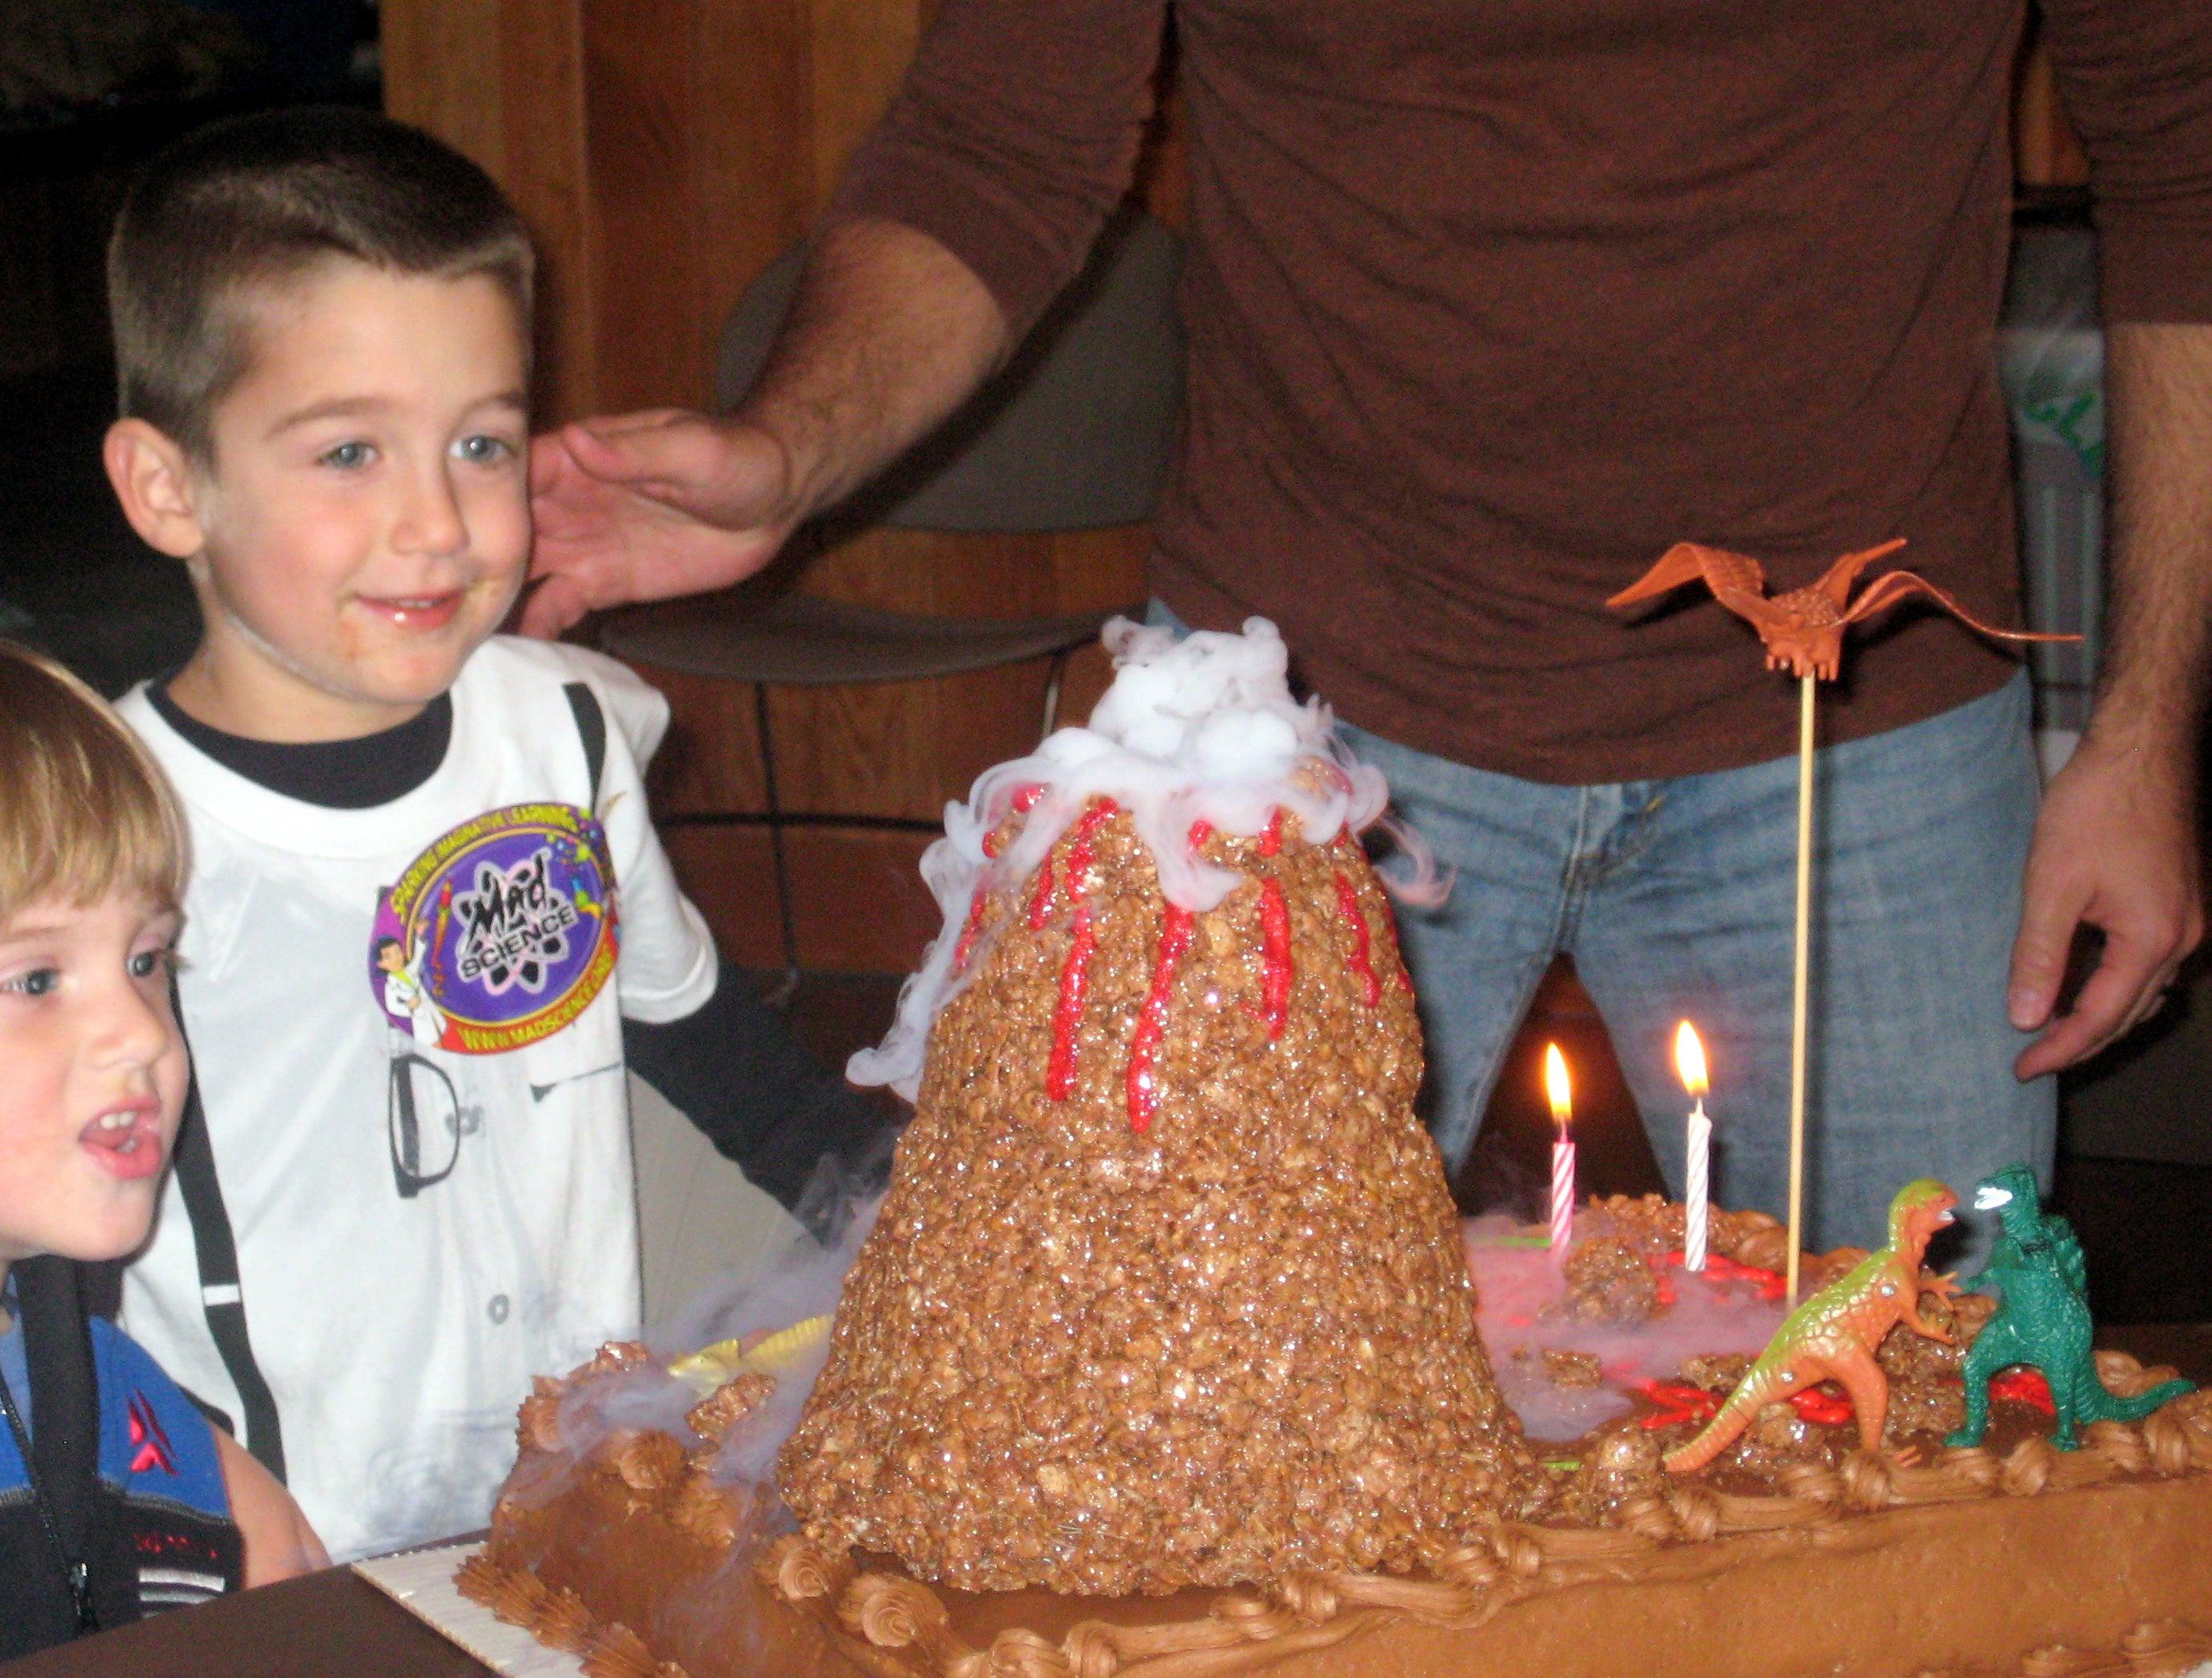 Fabulous Pretty Easy Erupting Volcano Birthday Cake Using Dry Ice 6 Personalised Birthday Cards Veneteletsinfo